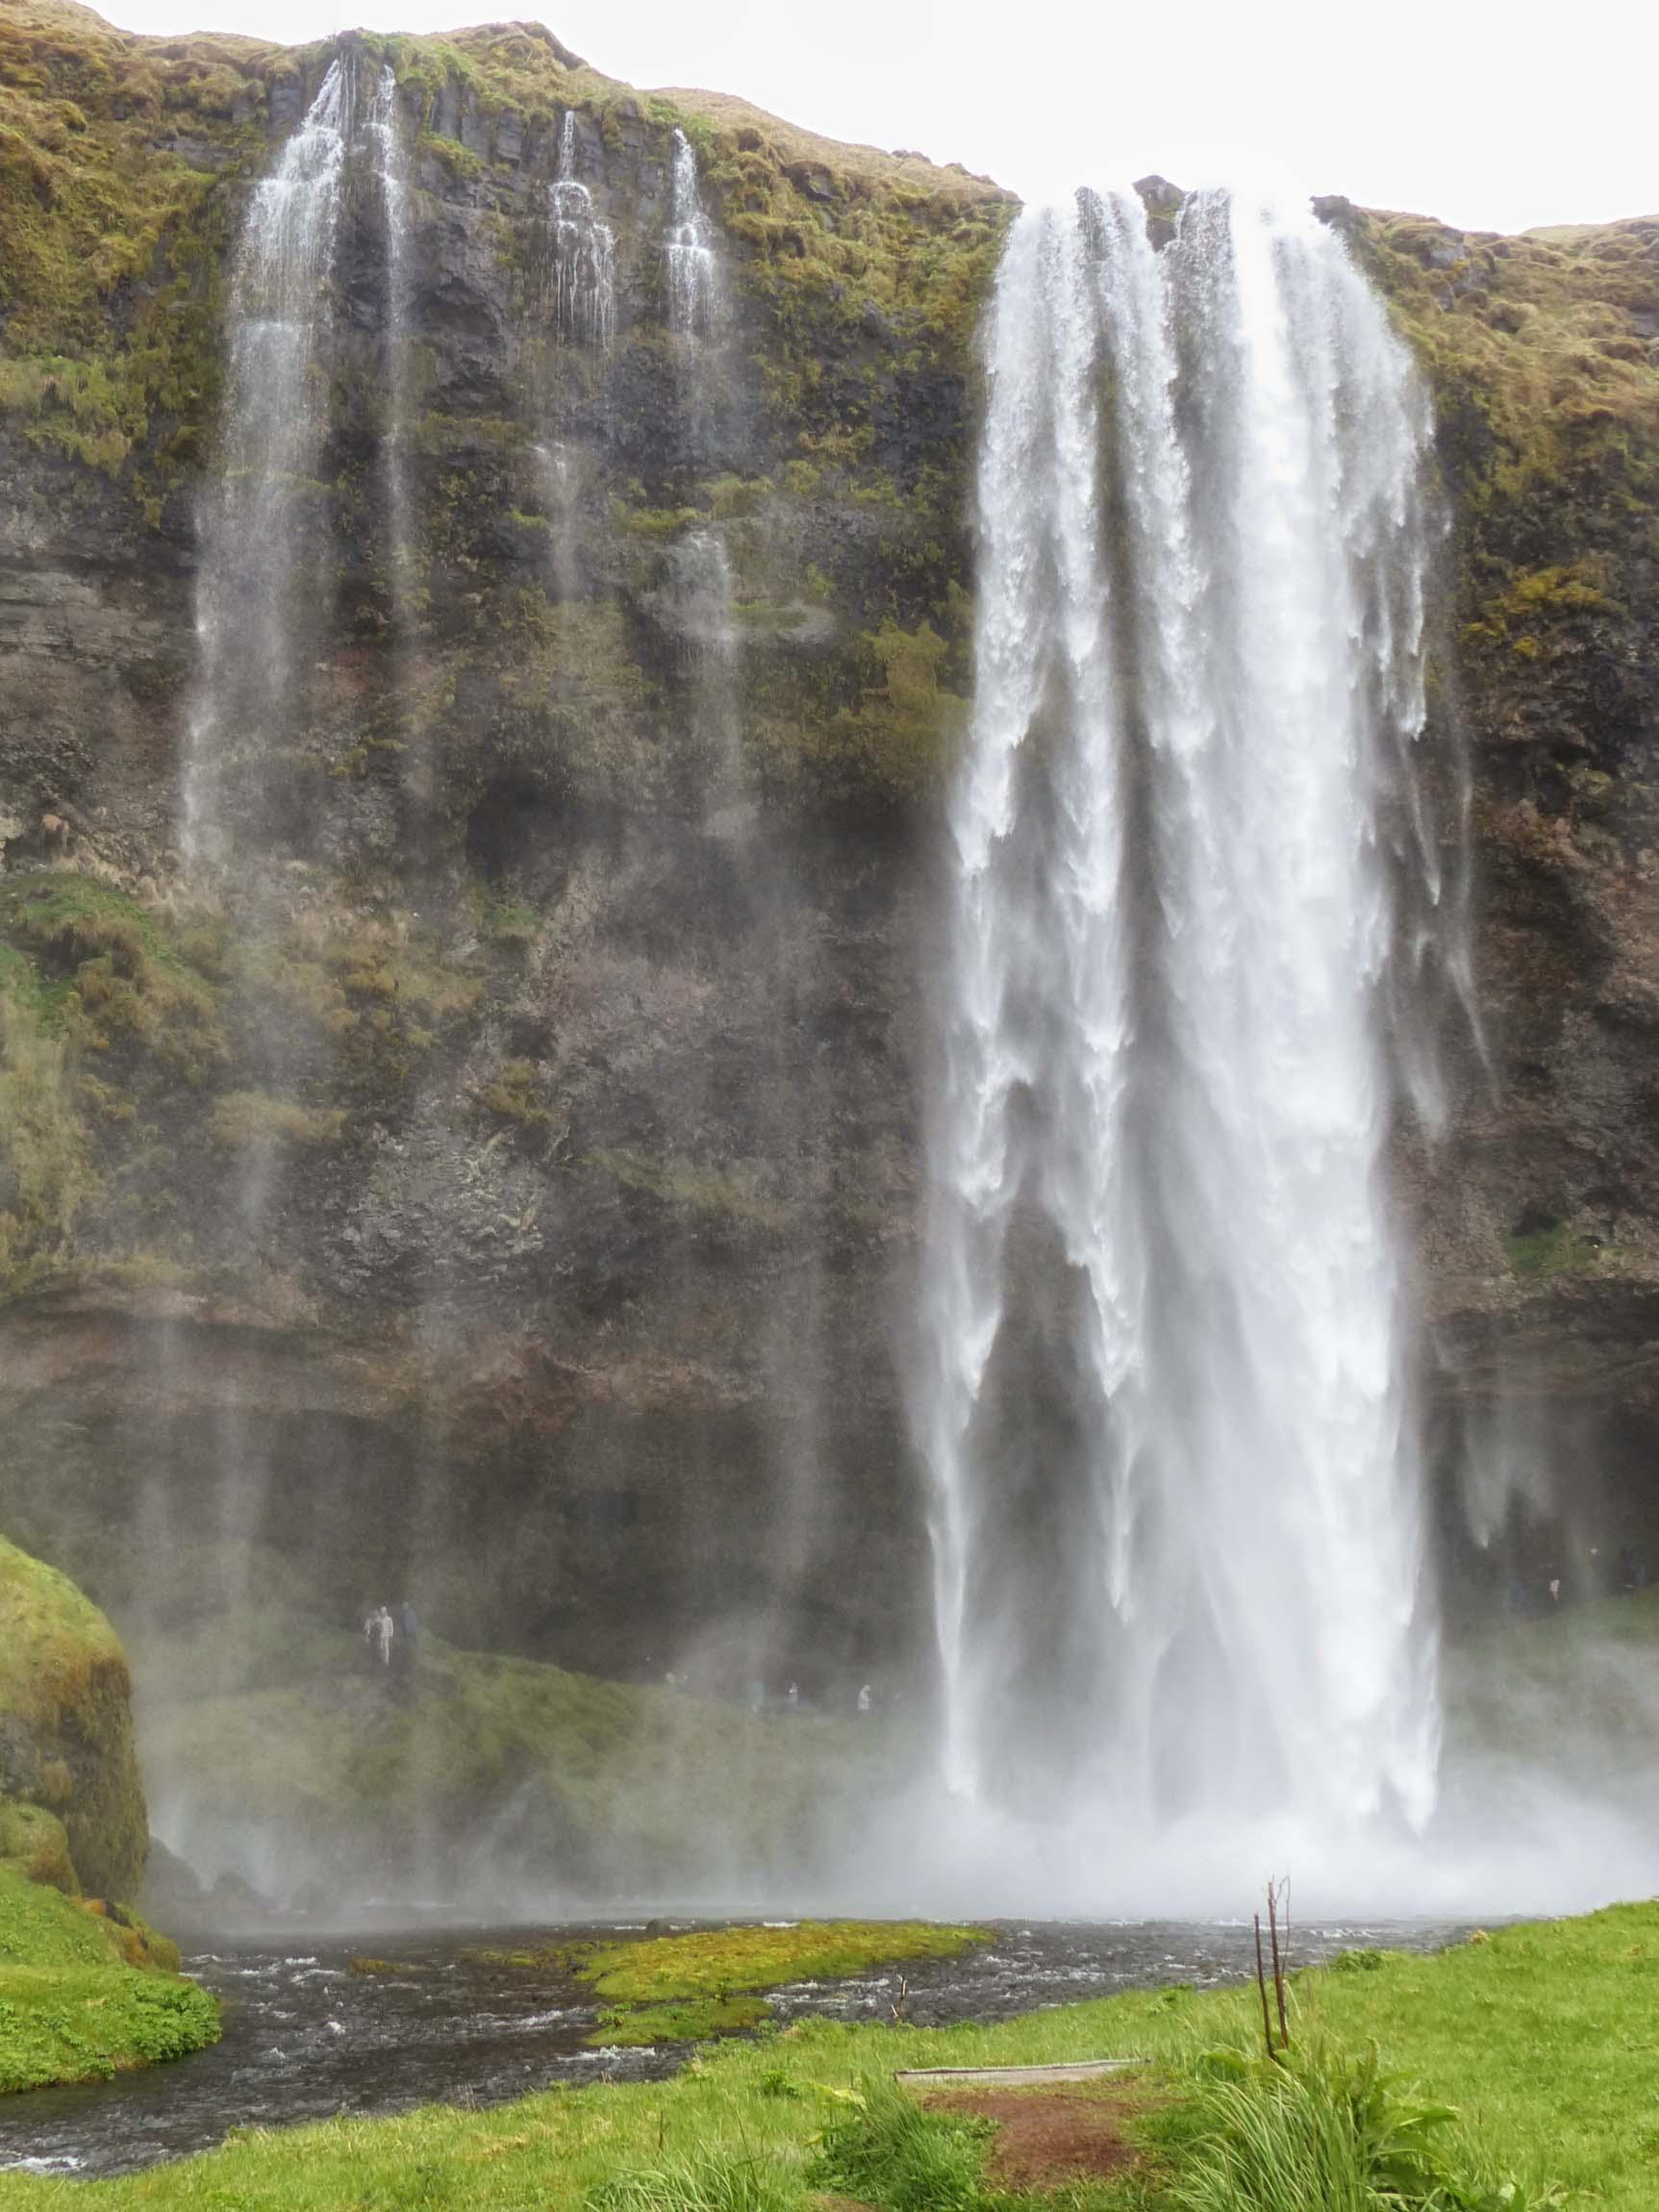 Veil-like waterfall